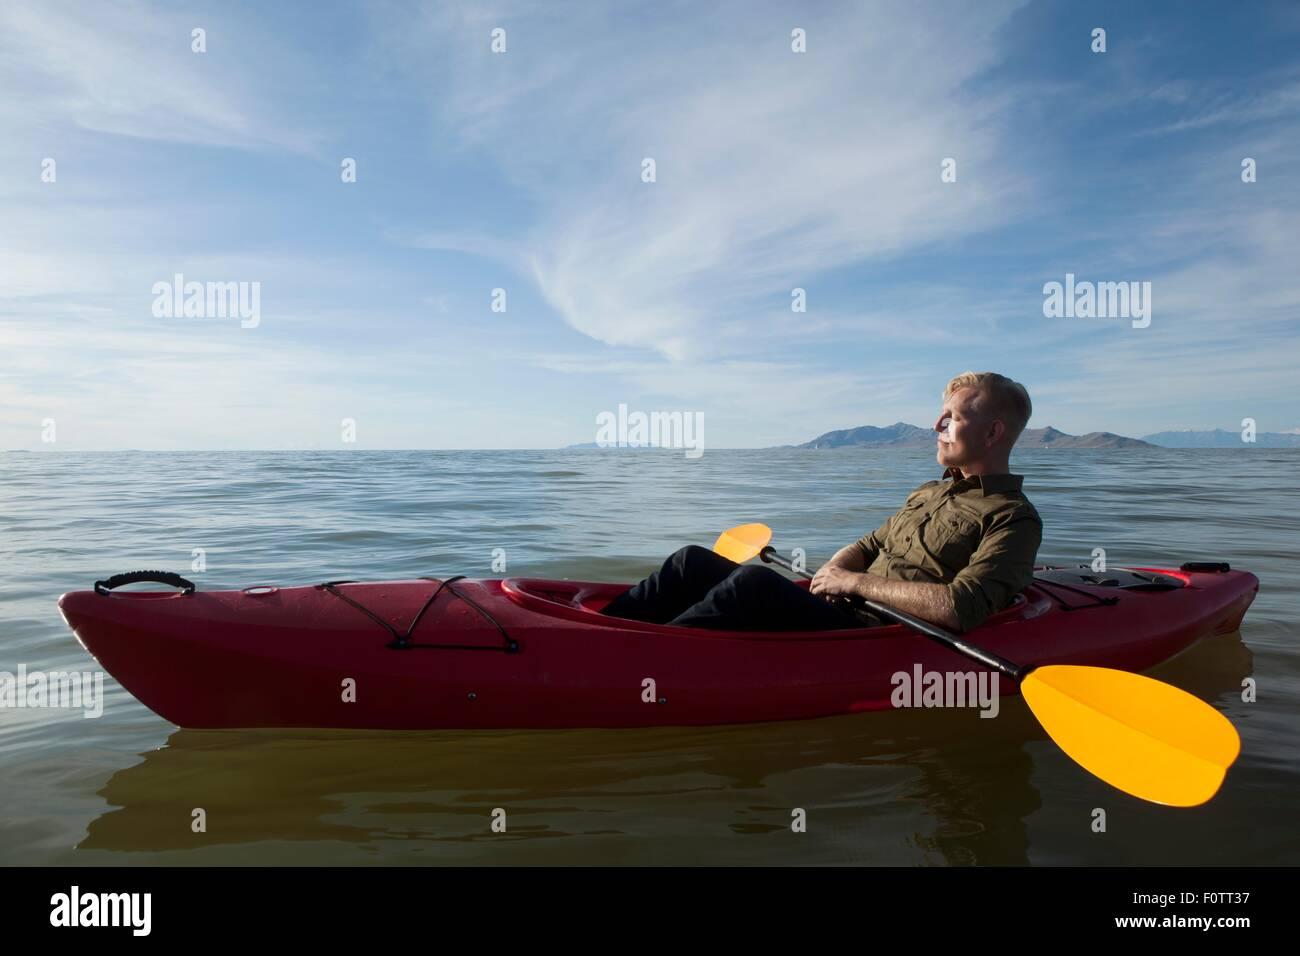 Side View Of Young Man In Kayak On Water Holding Paddles Eyes Closed Great Salt Lake Utah USA